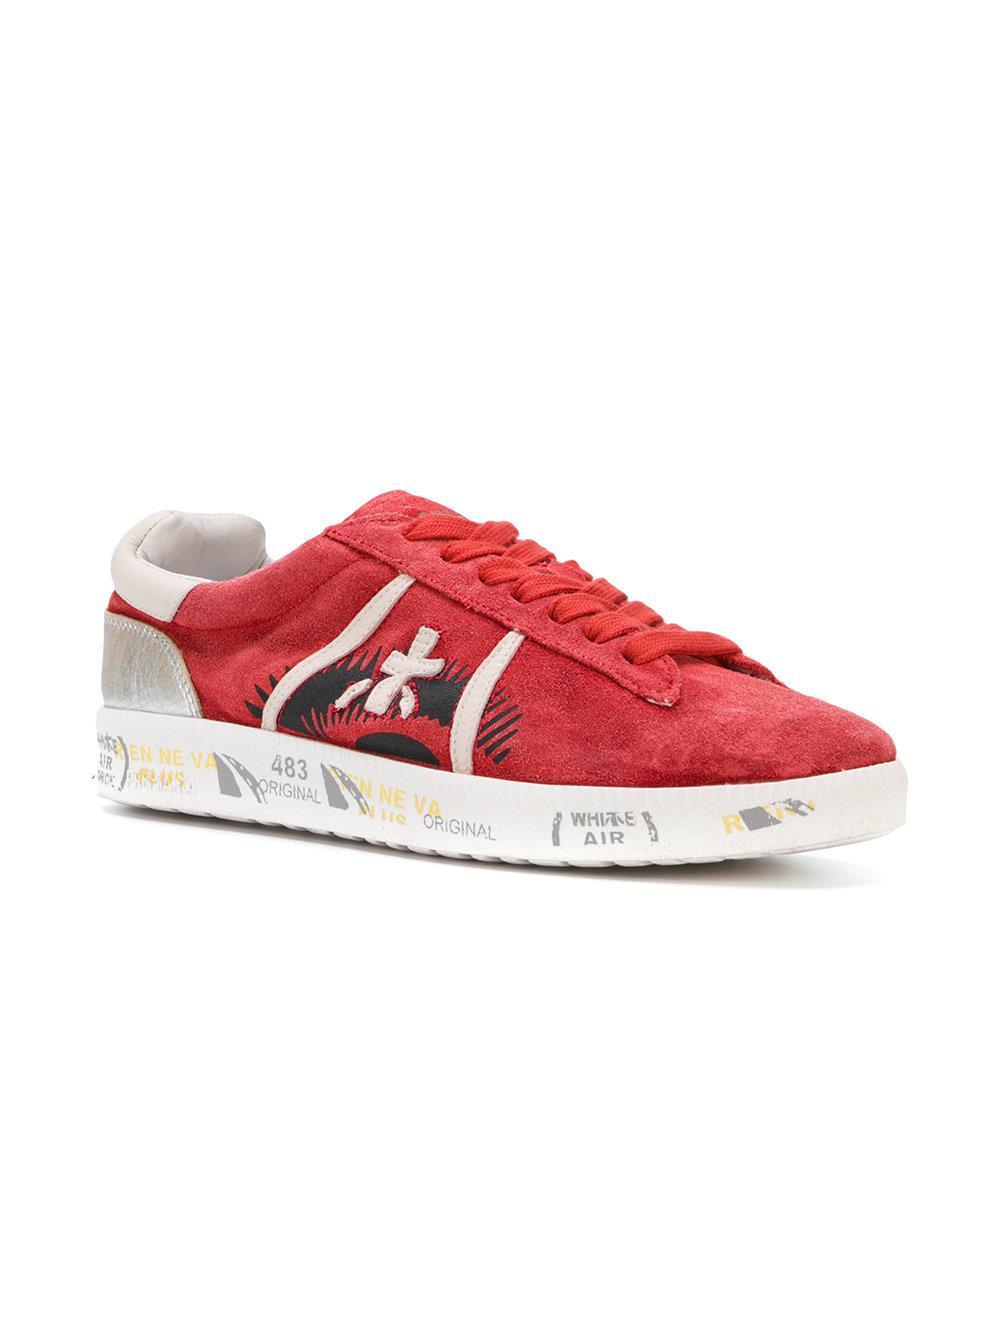 Premiata Ety-d Chaussures De Sport - Rouge MqD5wwUTh